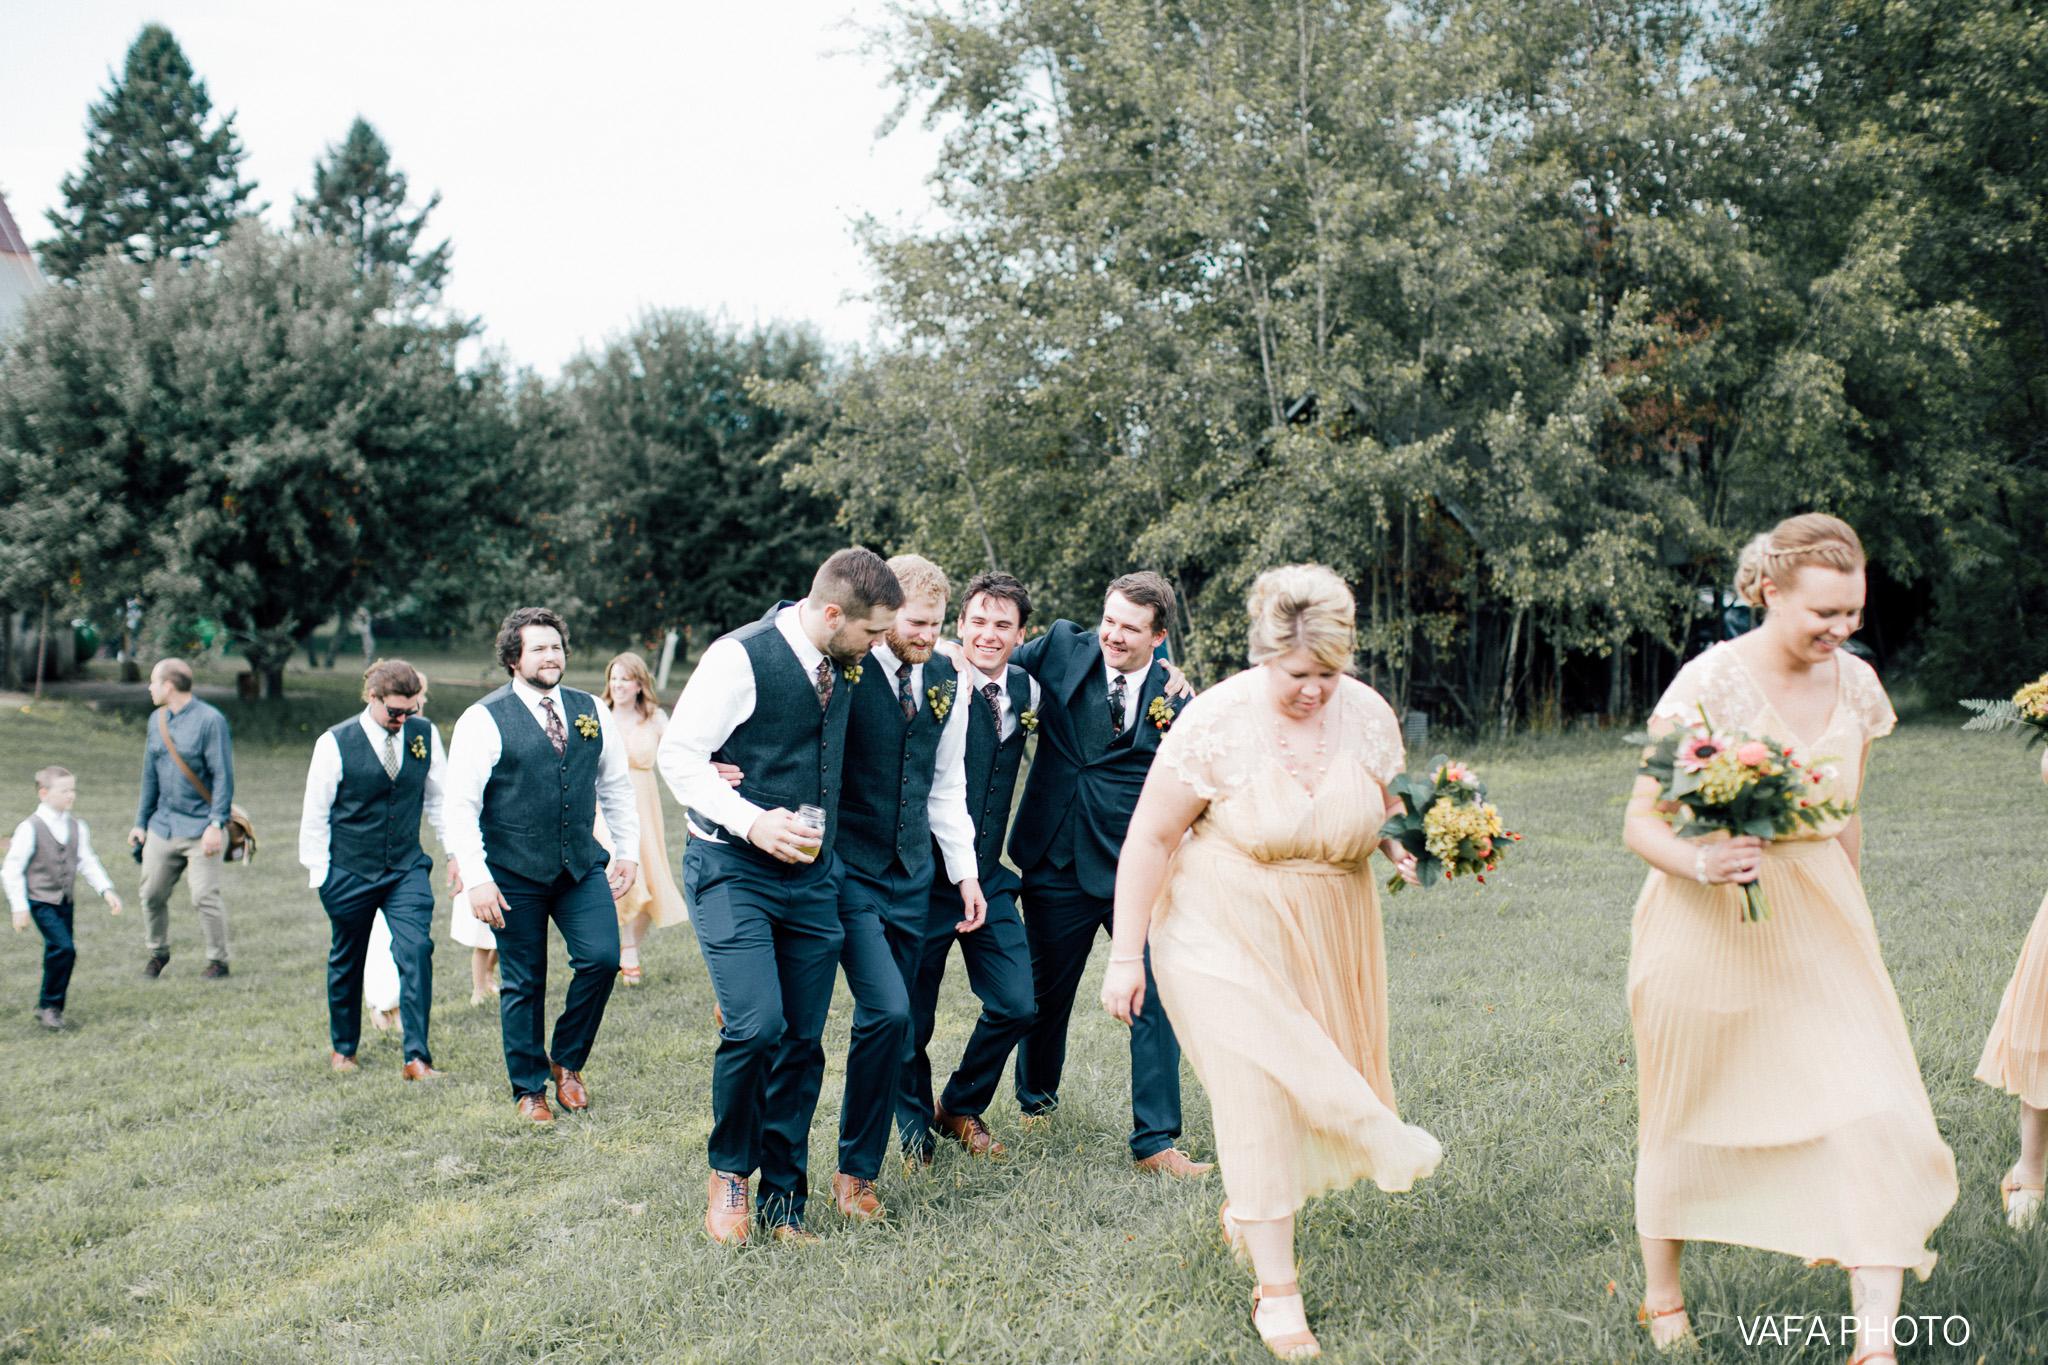 Belsolda-Farm-Wedding-Christy-Eric-Vafa-Photo-219.jpg